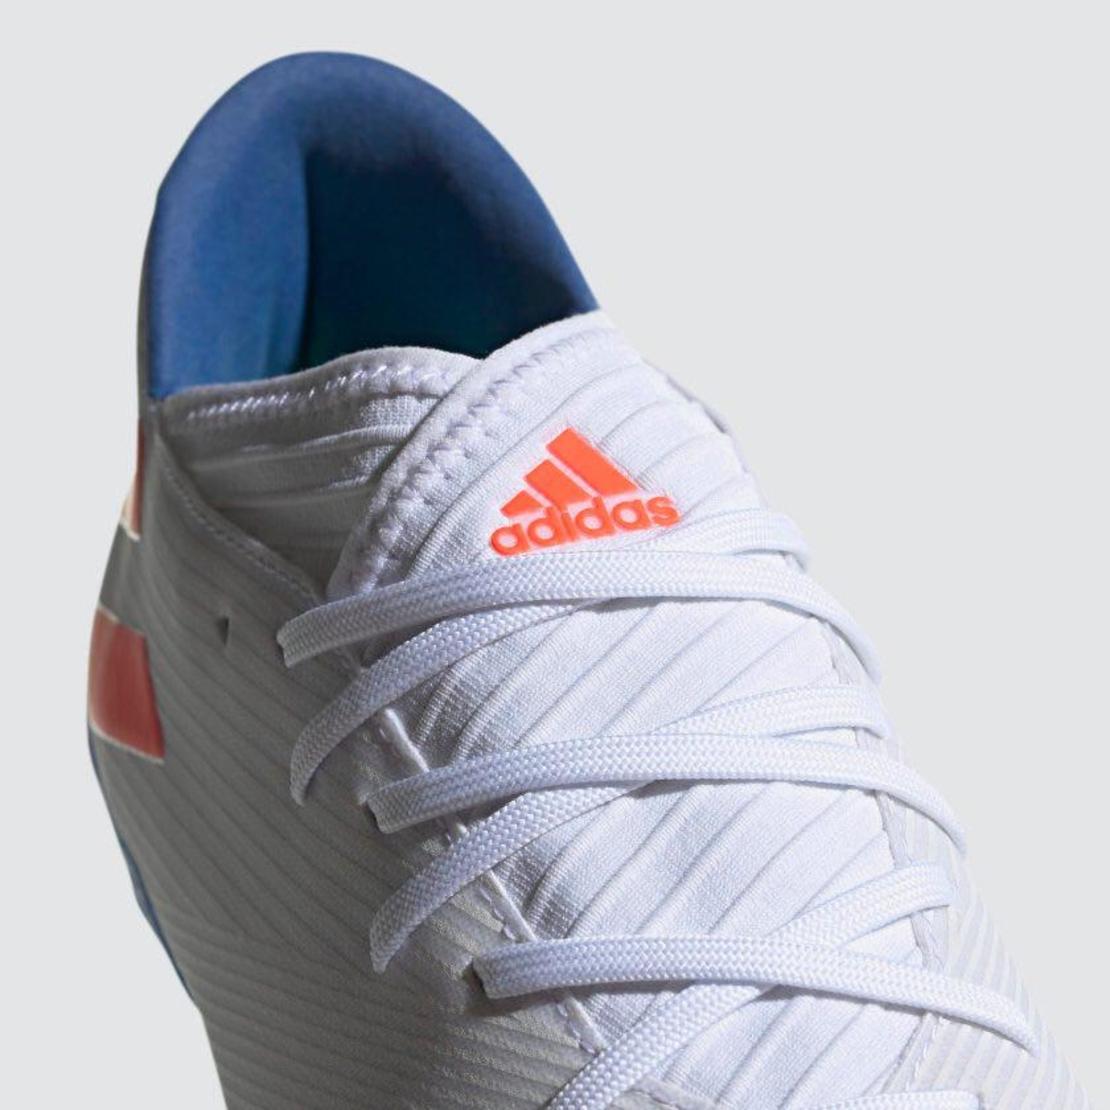 נעלי אדידס לגברים Adidas Nemeziz Messi 19.3 Fg